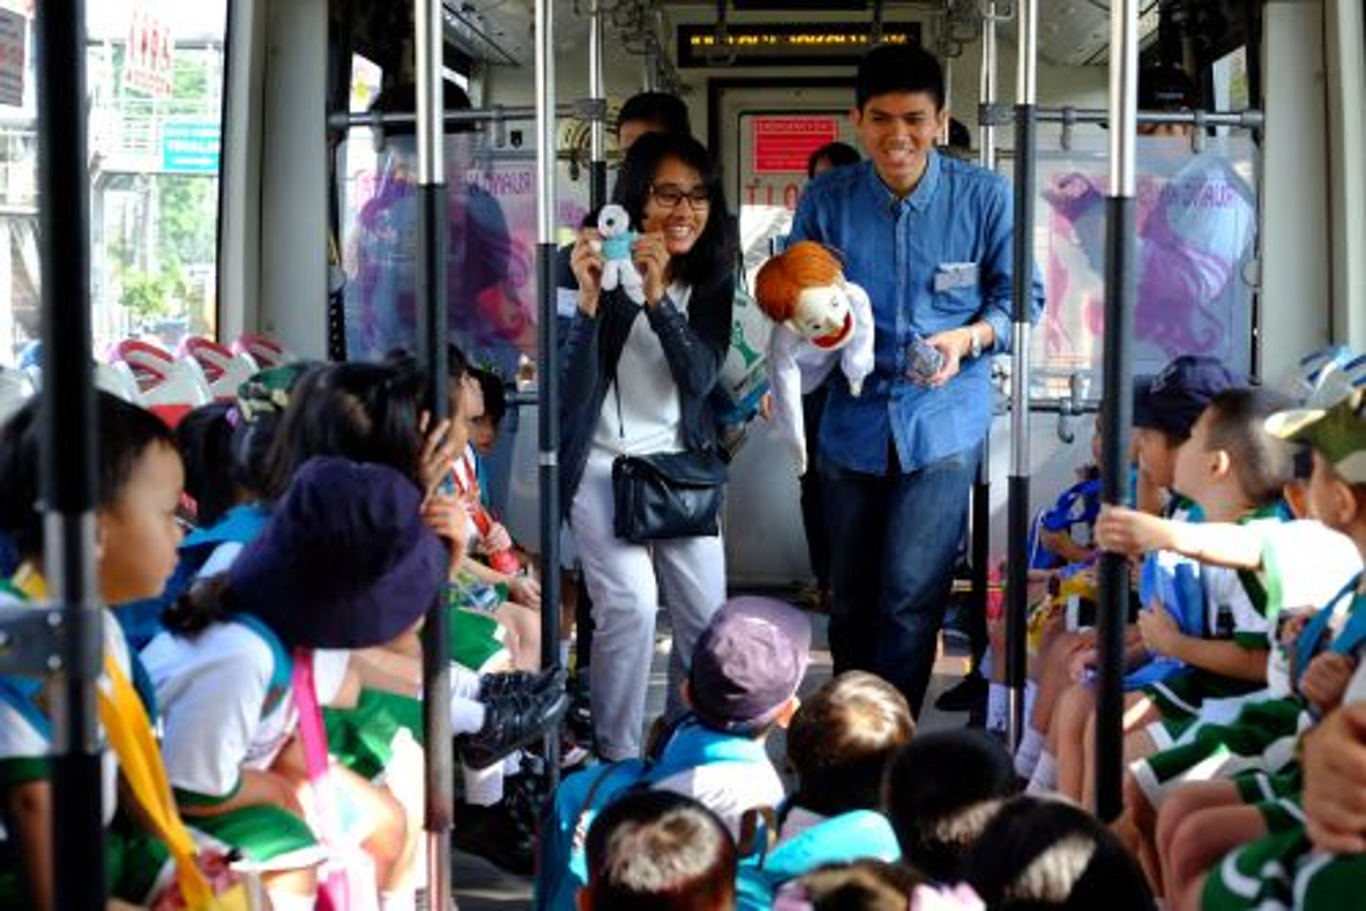 Komunitas Intrachange mengkampanyekan pendidikan transportasi kepada anak-anak/istimewa